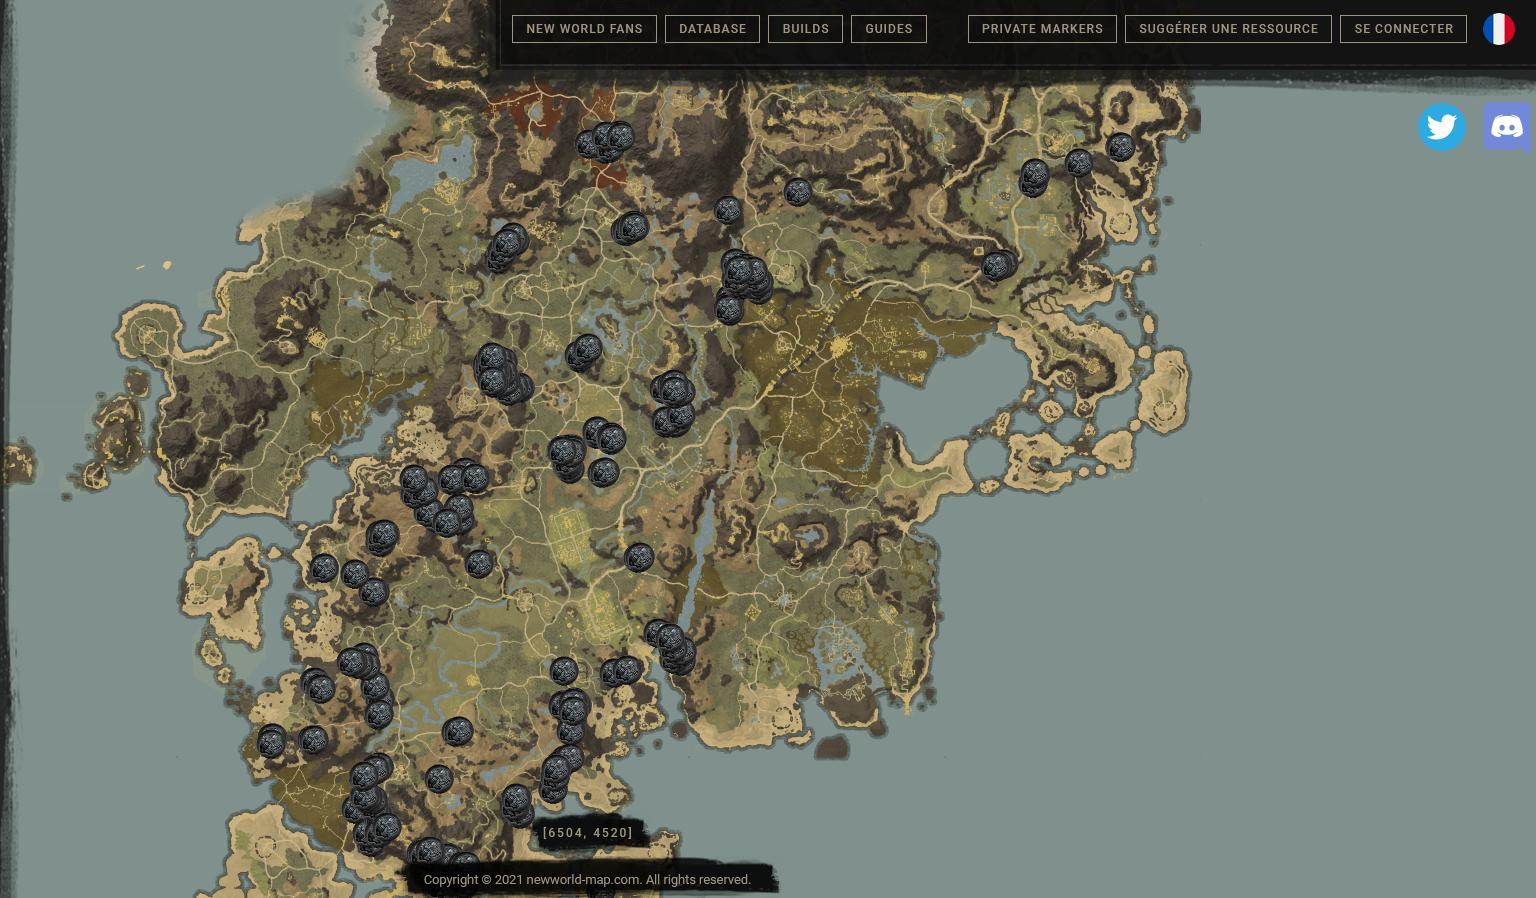 minerai-argent-gisement-new-world